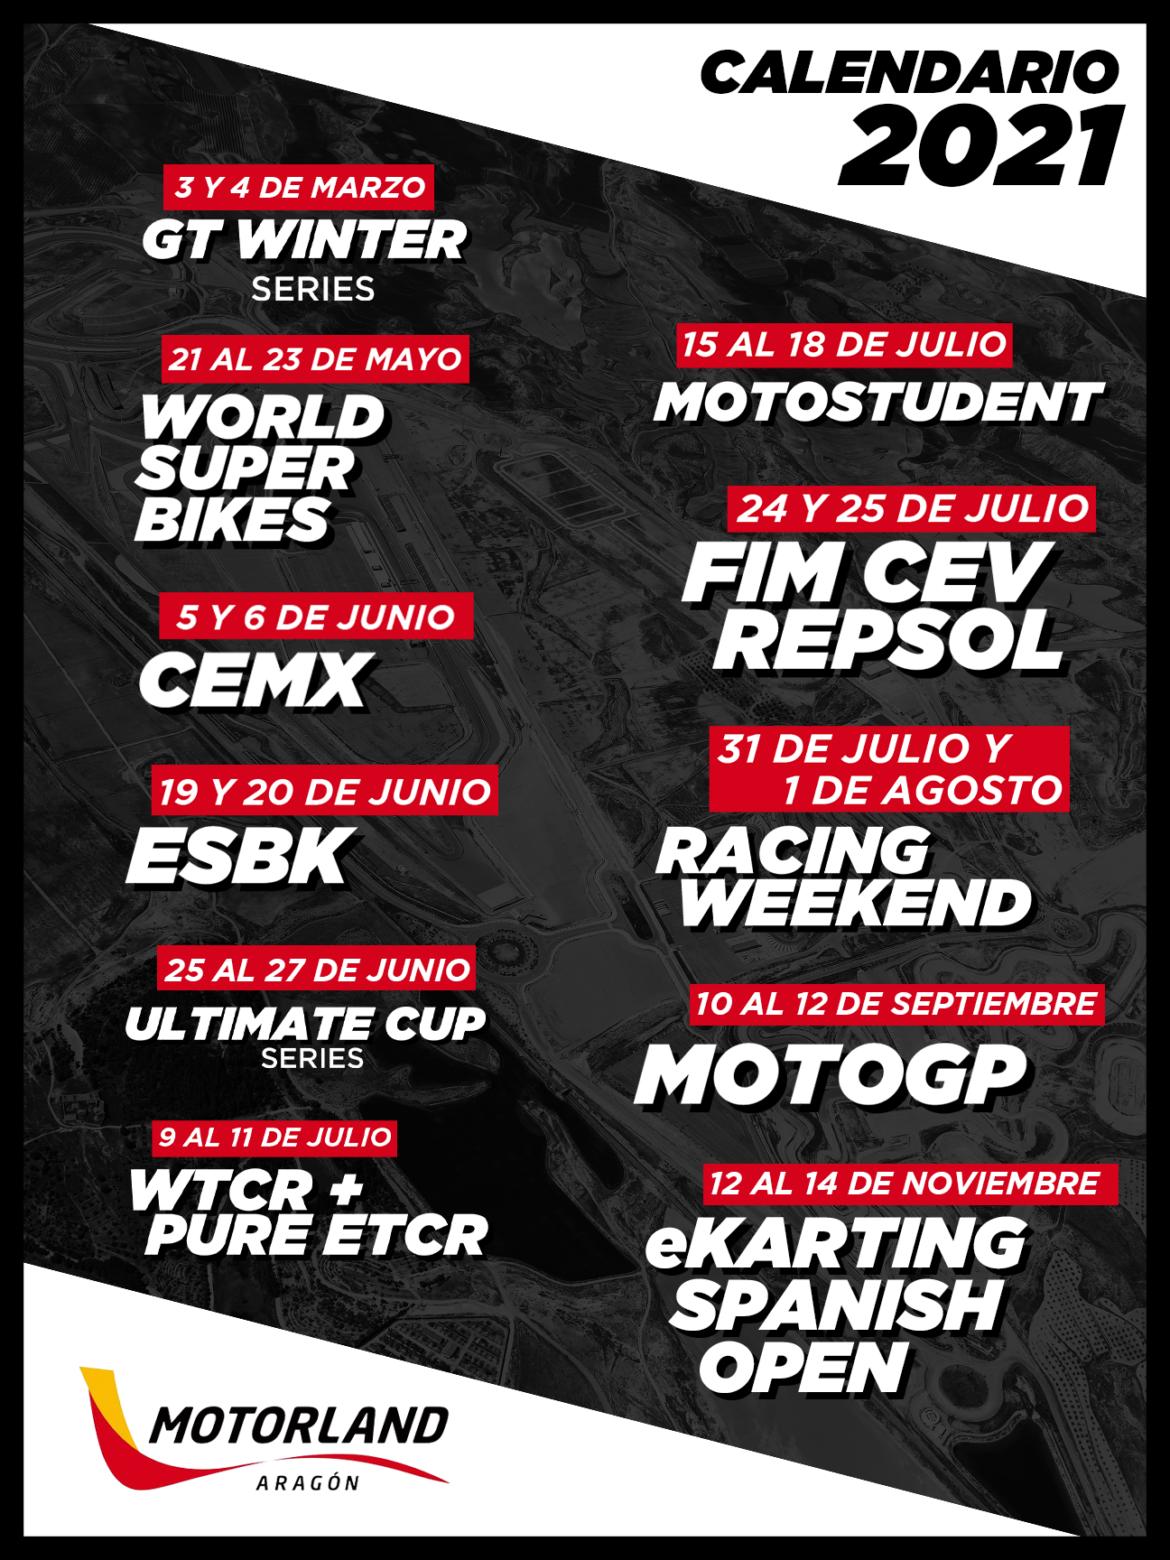 Motorland Aragón calendario 2021